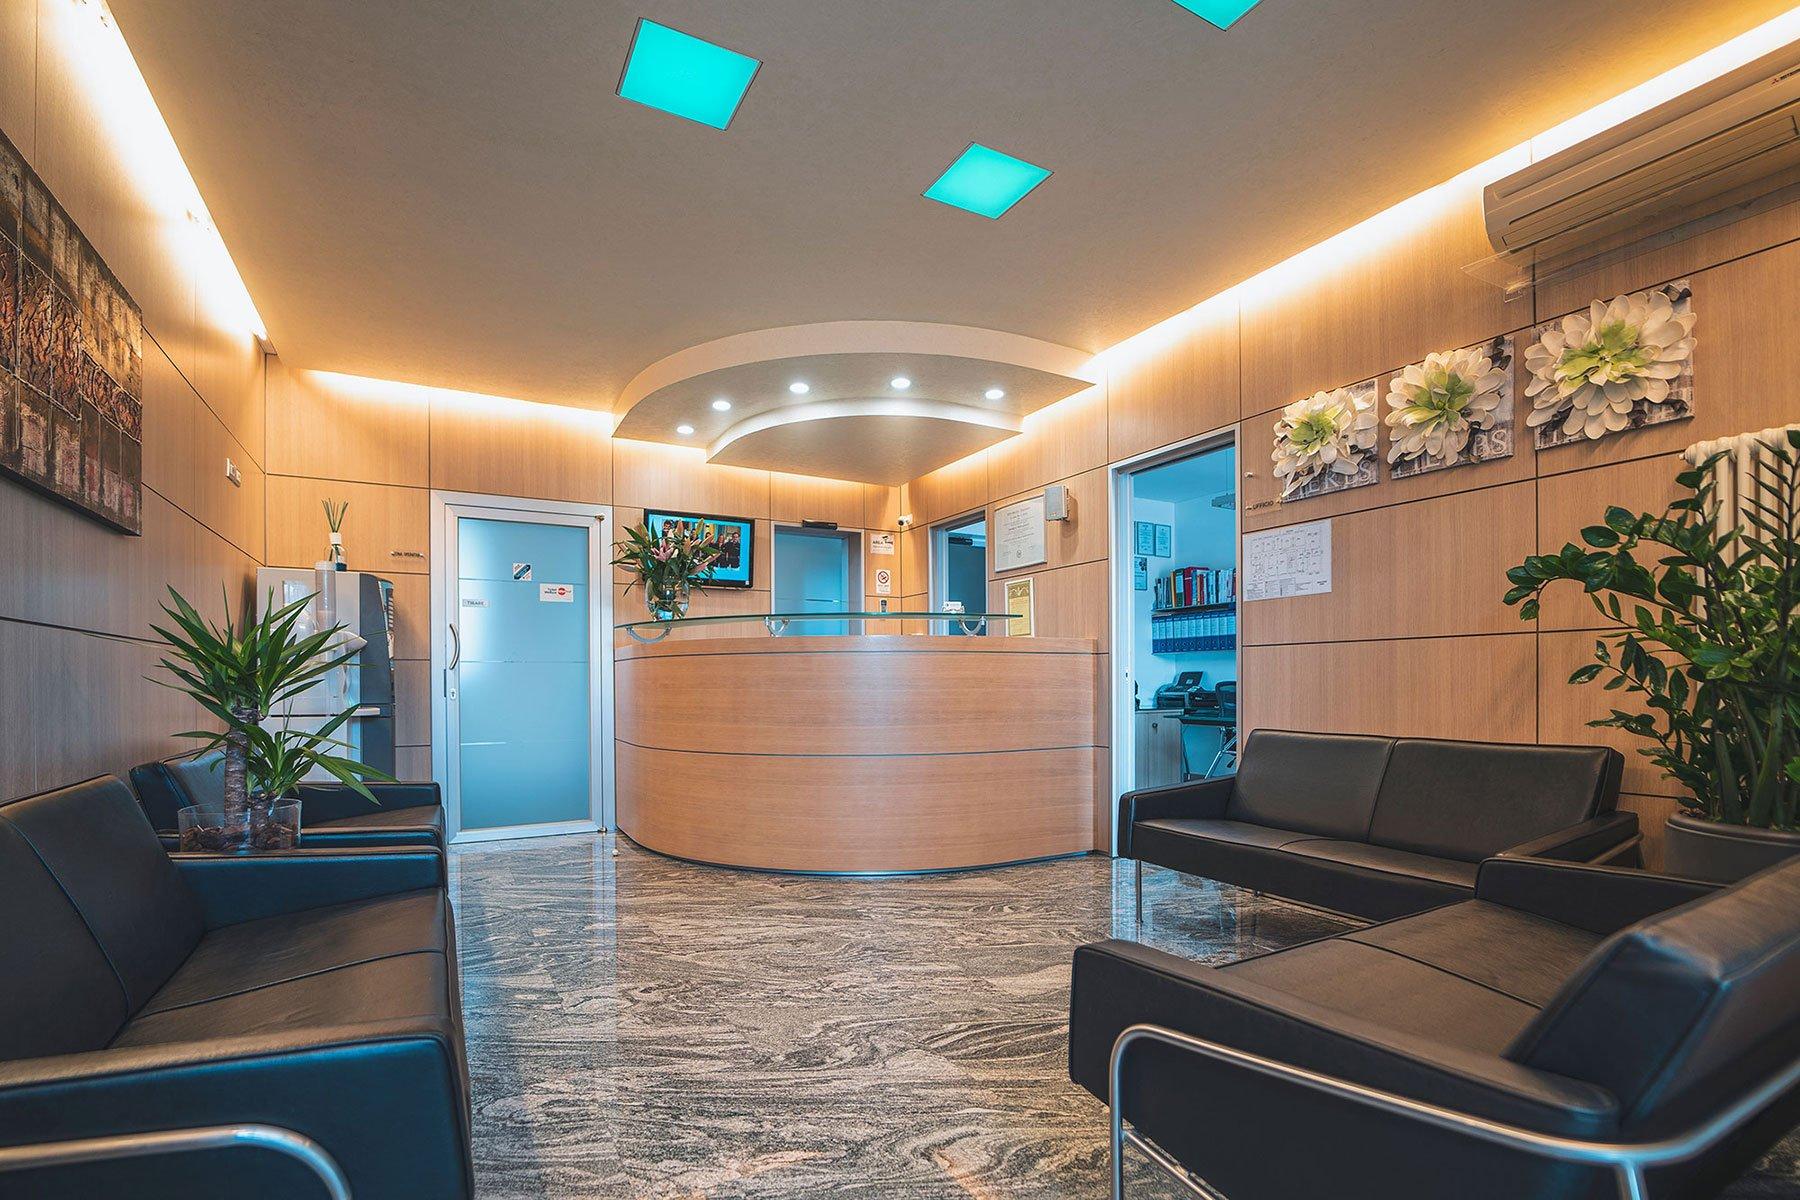 Studio odontoiatrico a San Donà di Piave